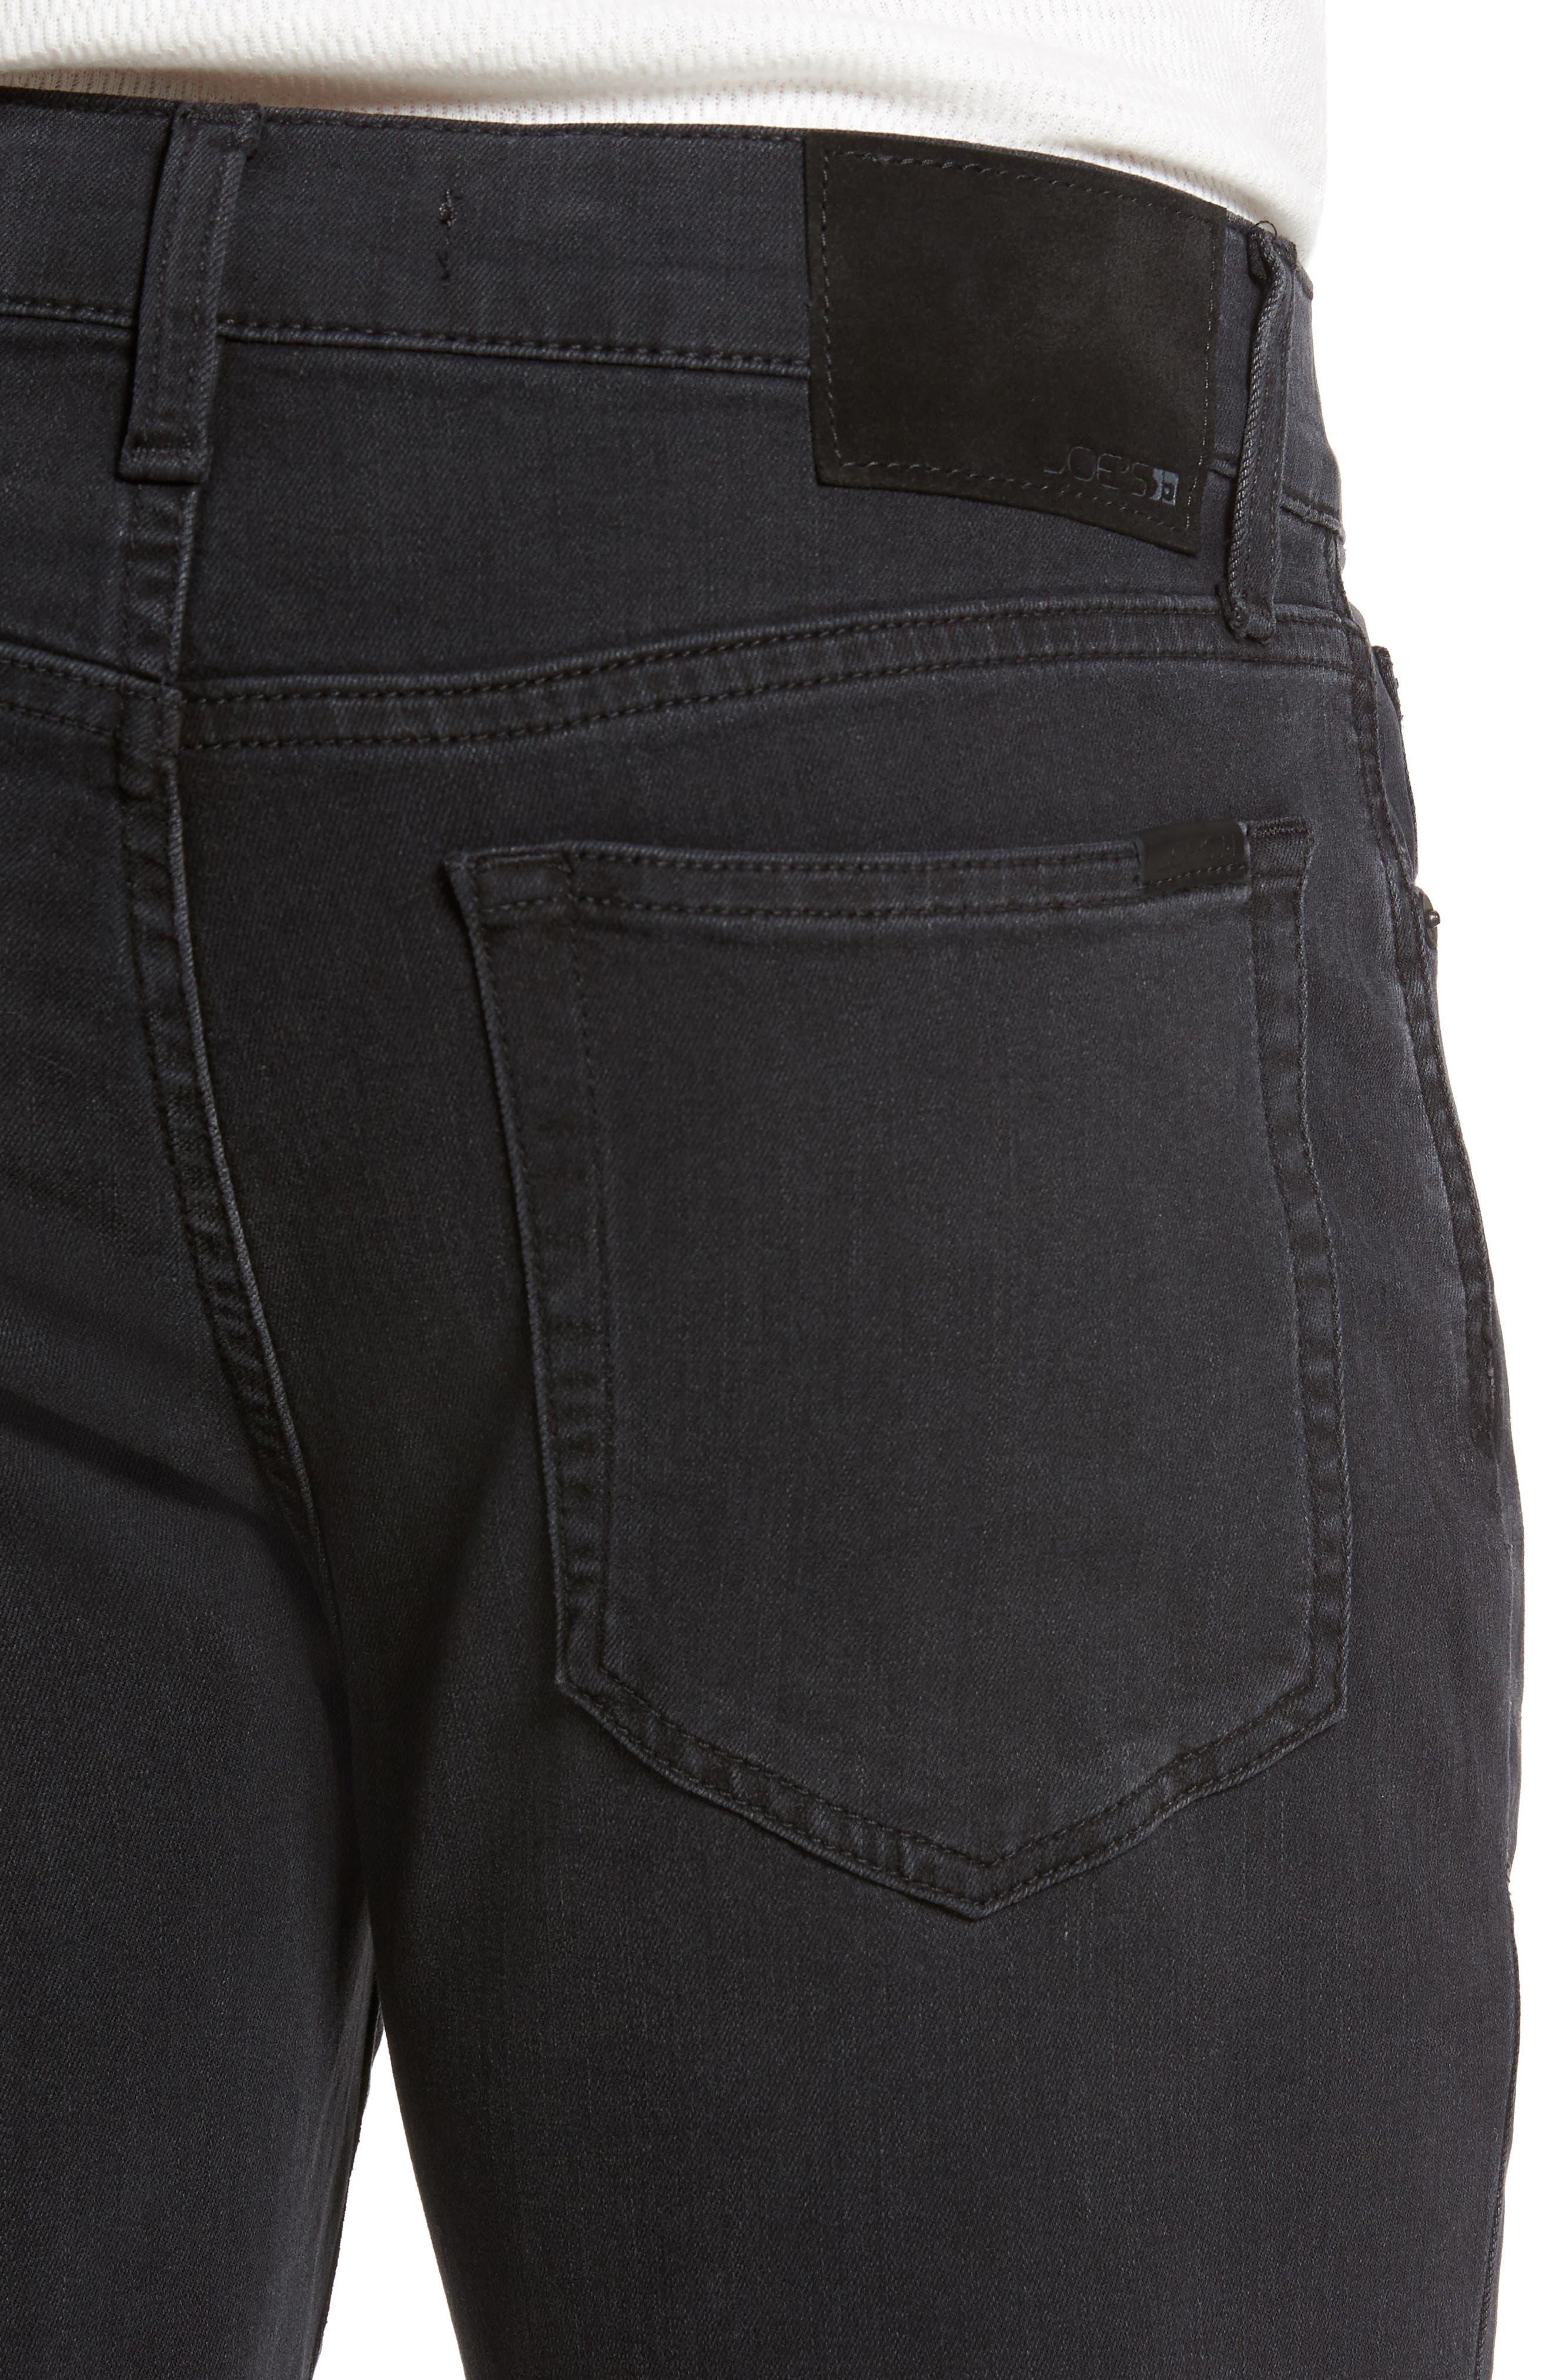 Slim Fit Jeans,                             Alternate thumbnail 4, color,                             Beldon